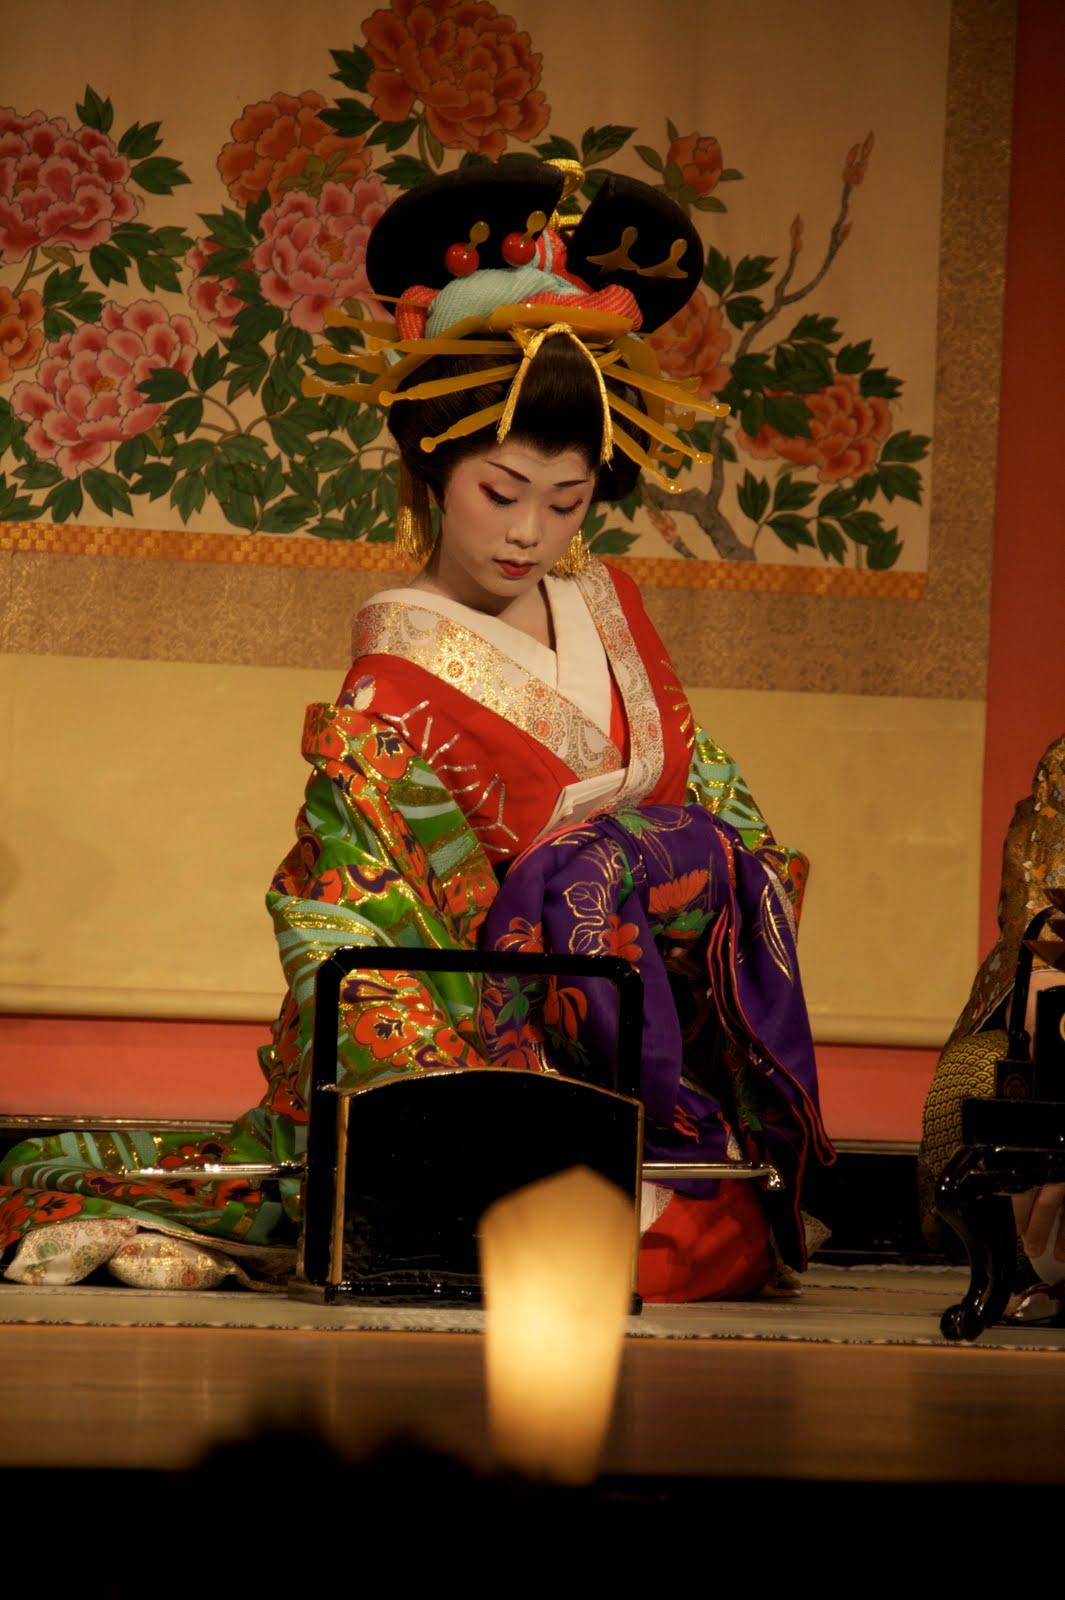 The Kimono Lady May 2010